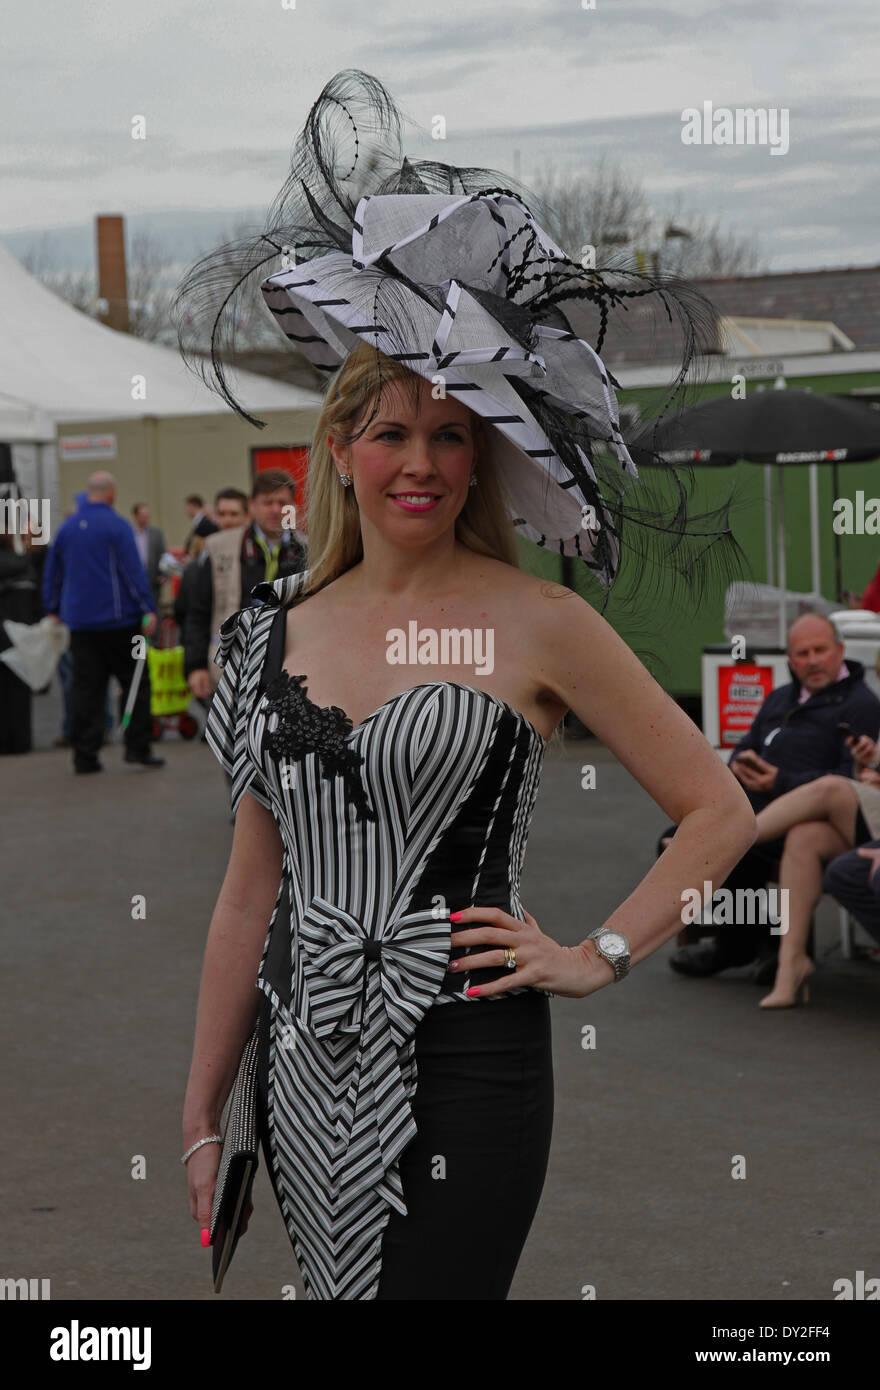 Aintree Ladies Racecourse Immagini   Aintree Ladies Racecourse Fotos ... 92163ce88868